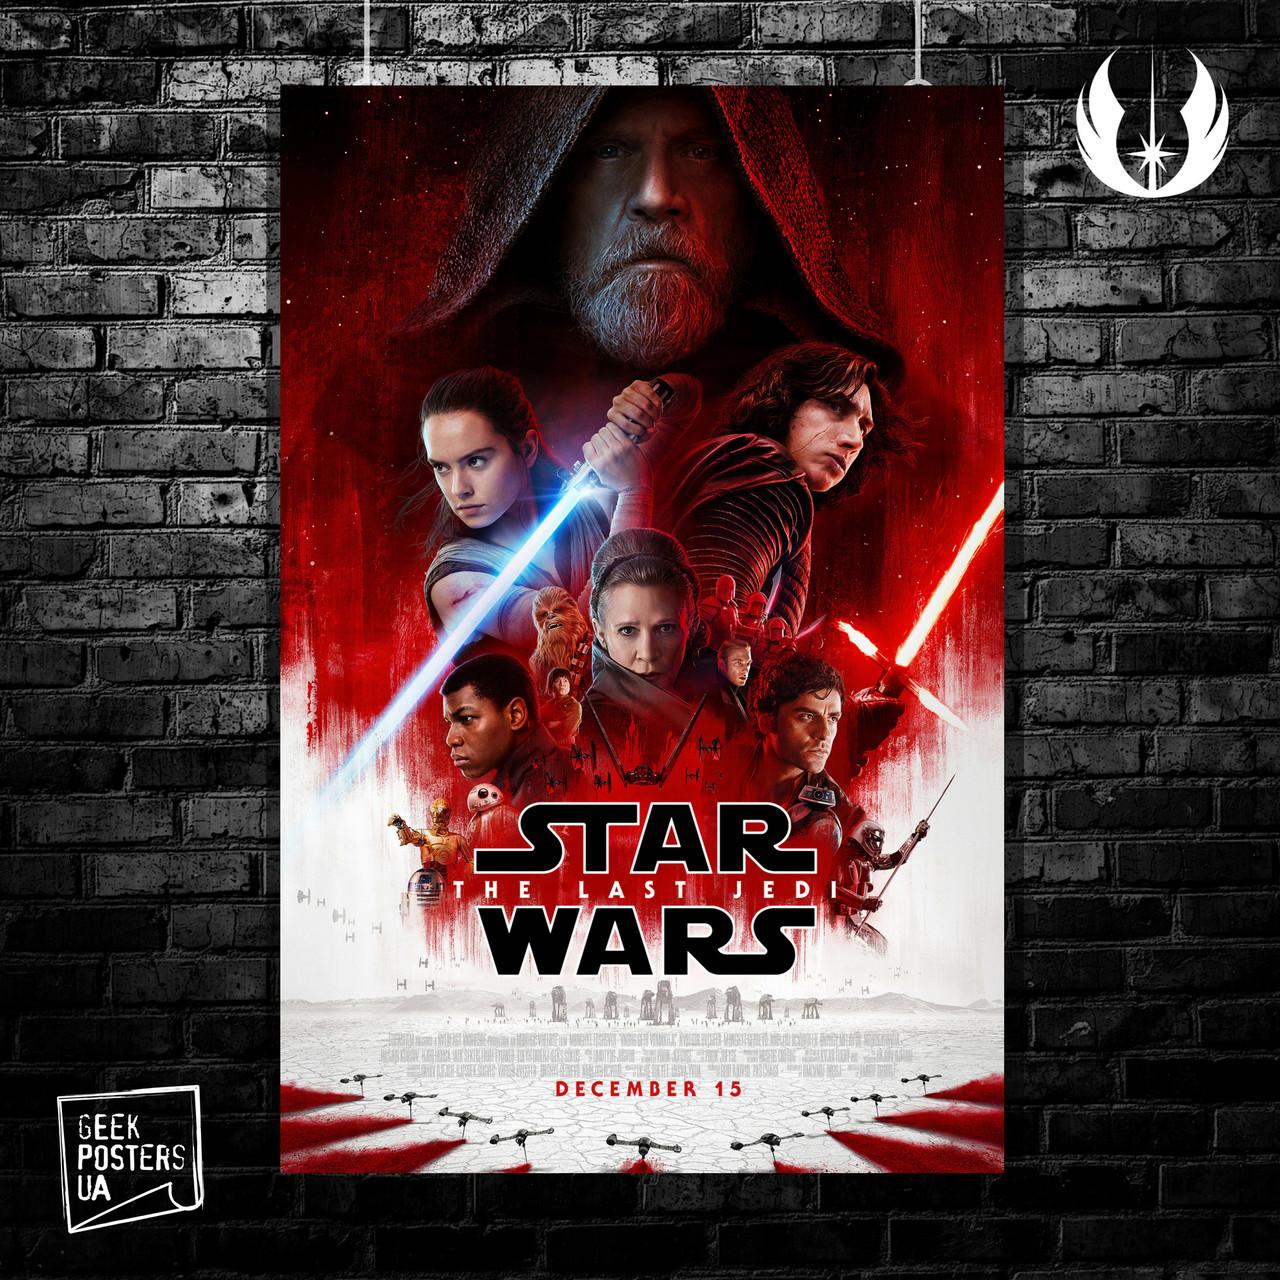 Постер Star Wars: Last Jedi (все персонажи, красный). Размер 60x42см (A2). Глянцевая бумага